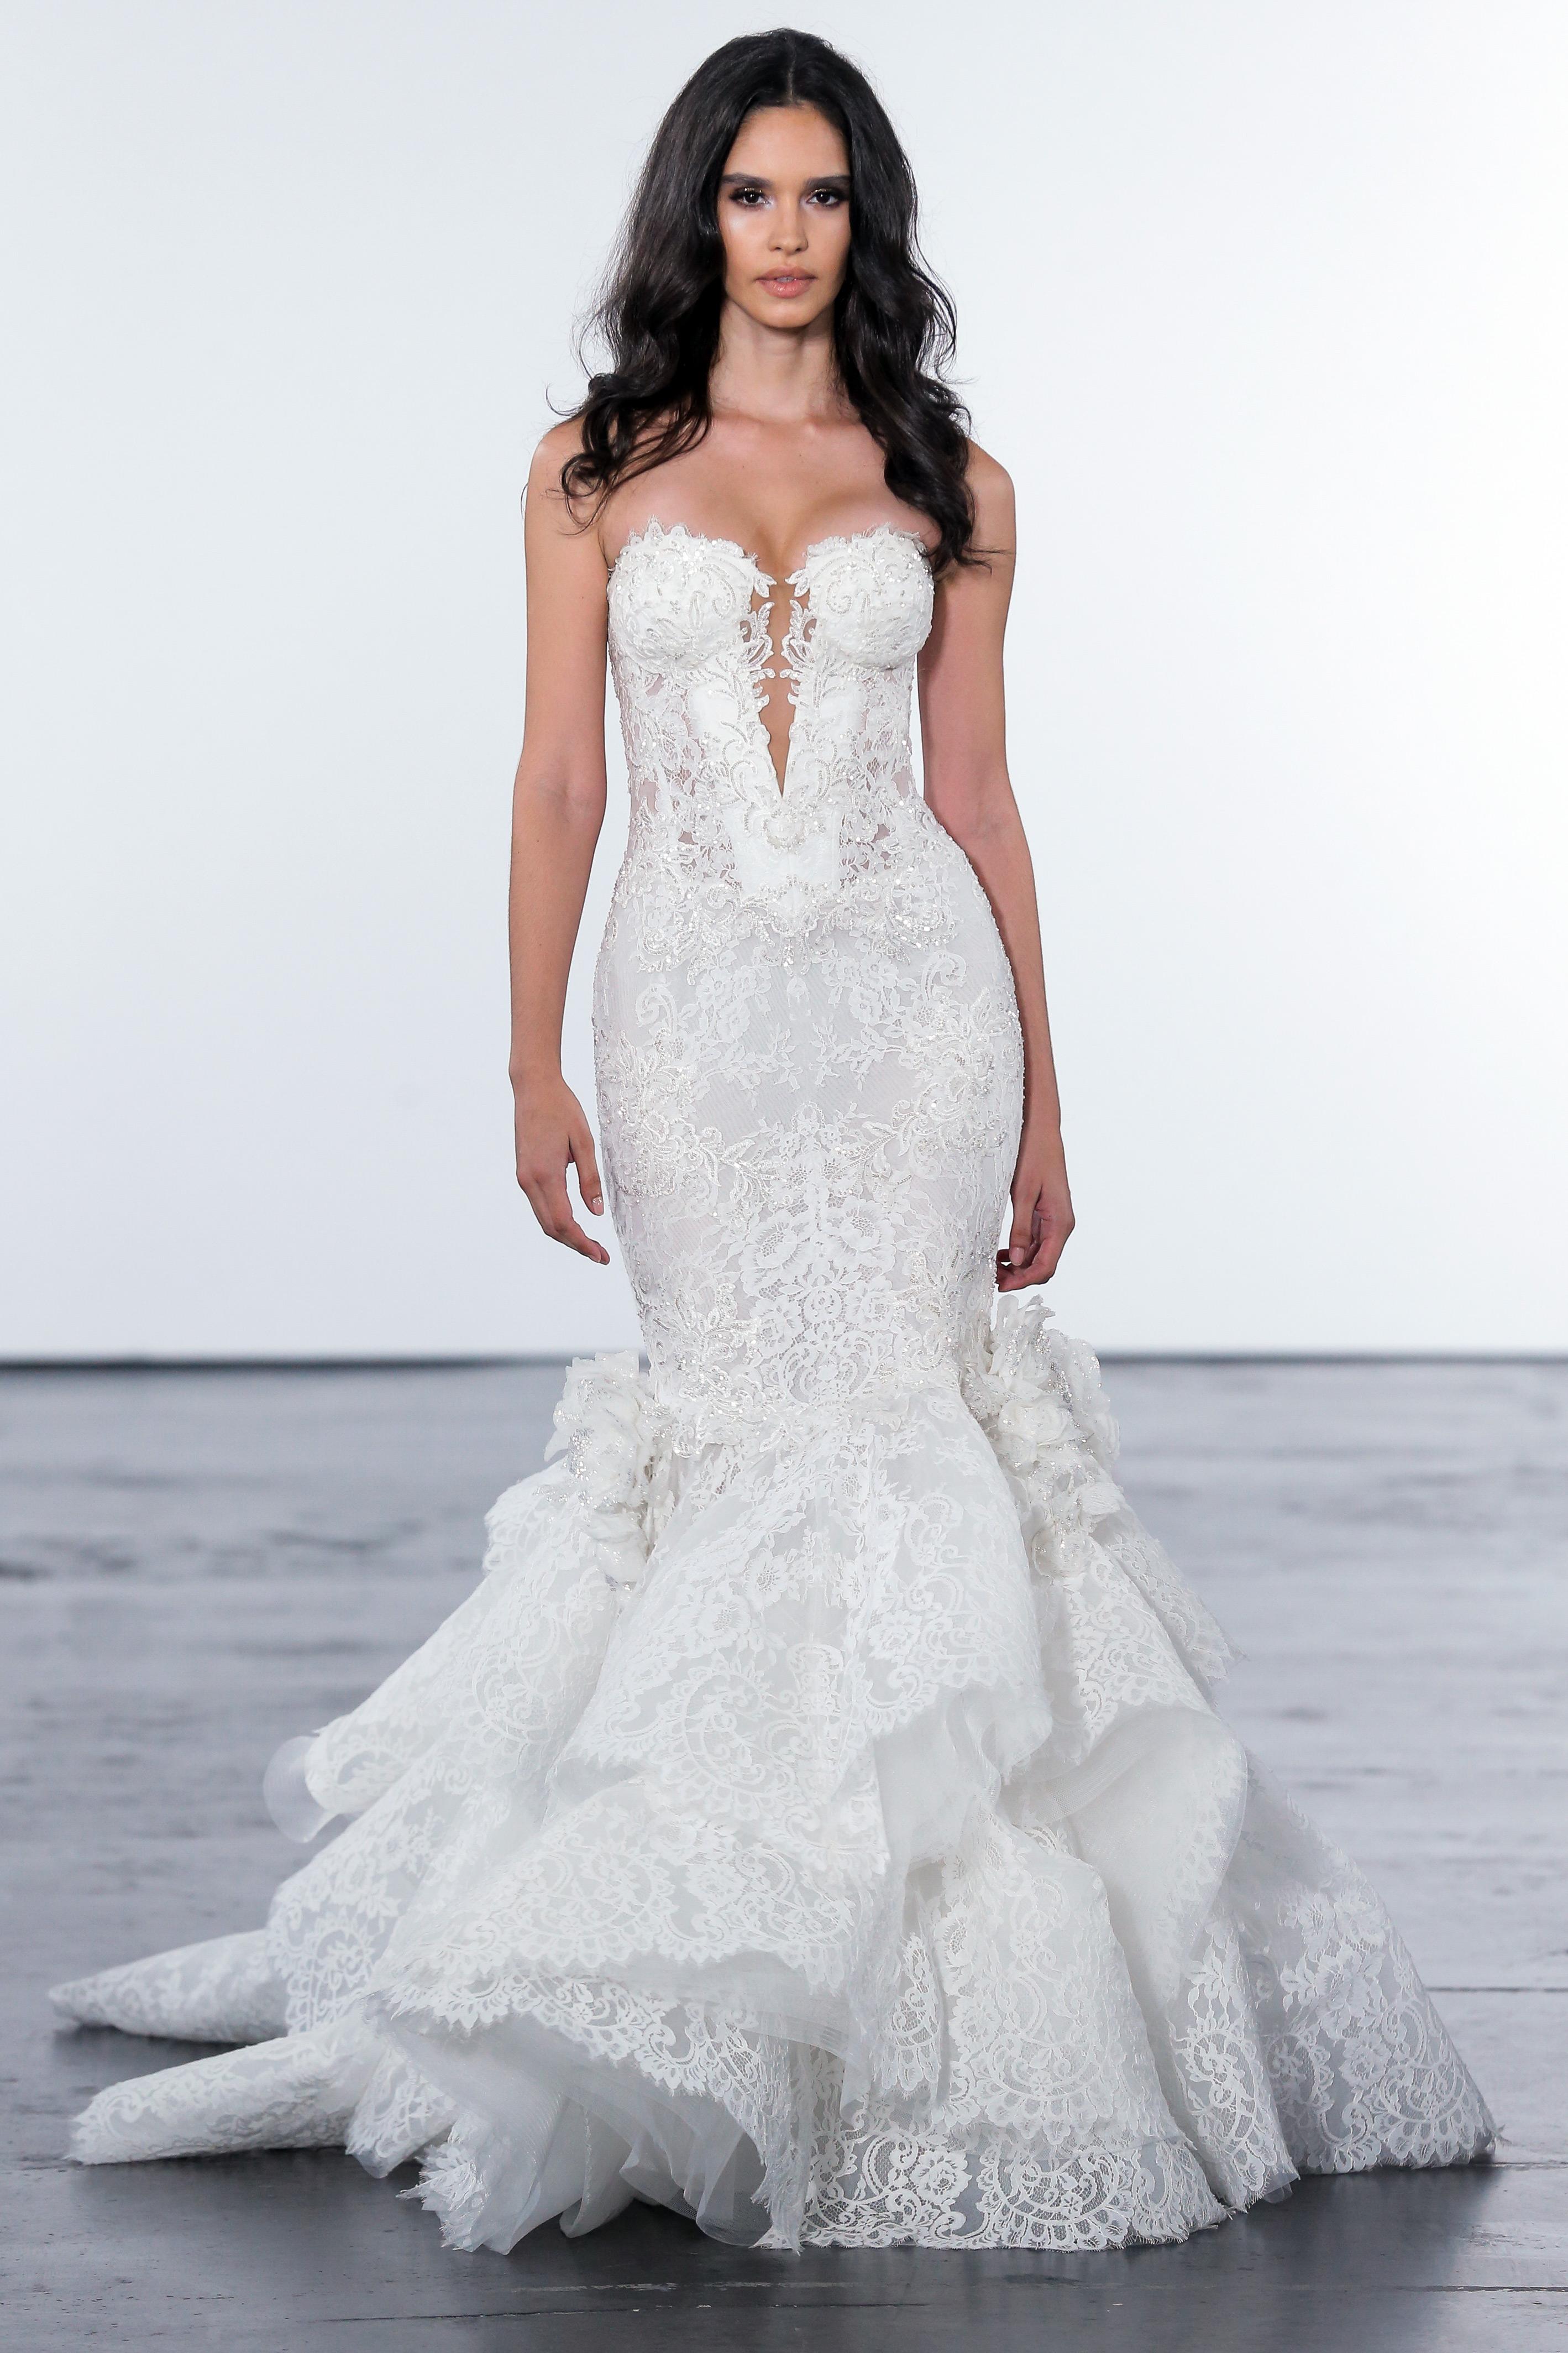 pnina tornai fall 2018 lace detail wedding dress